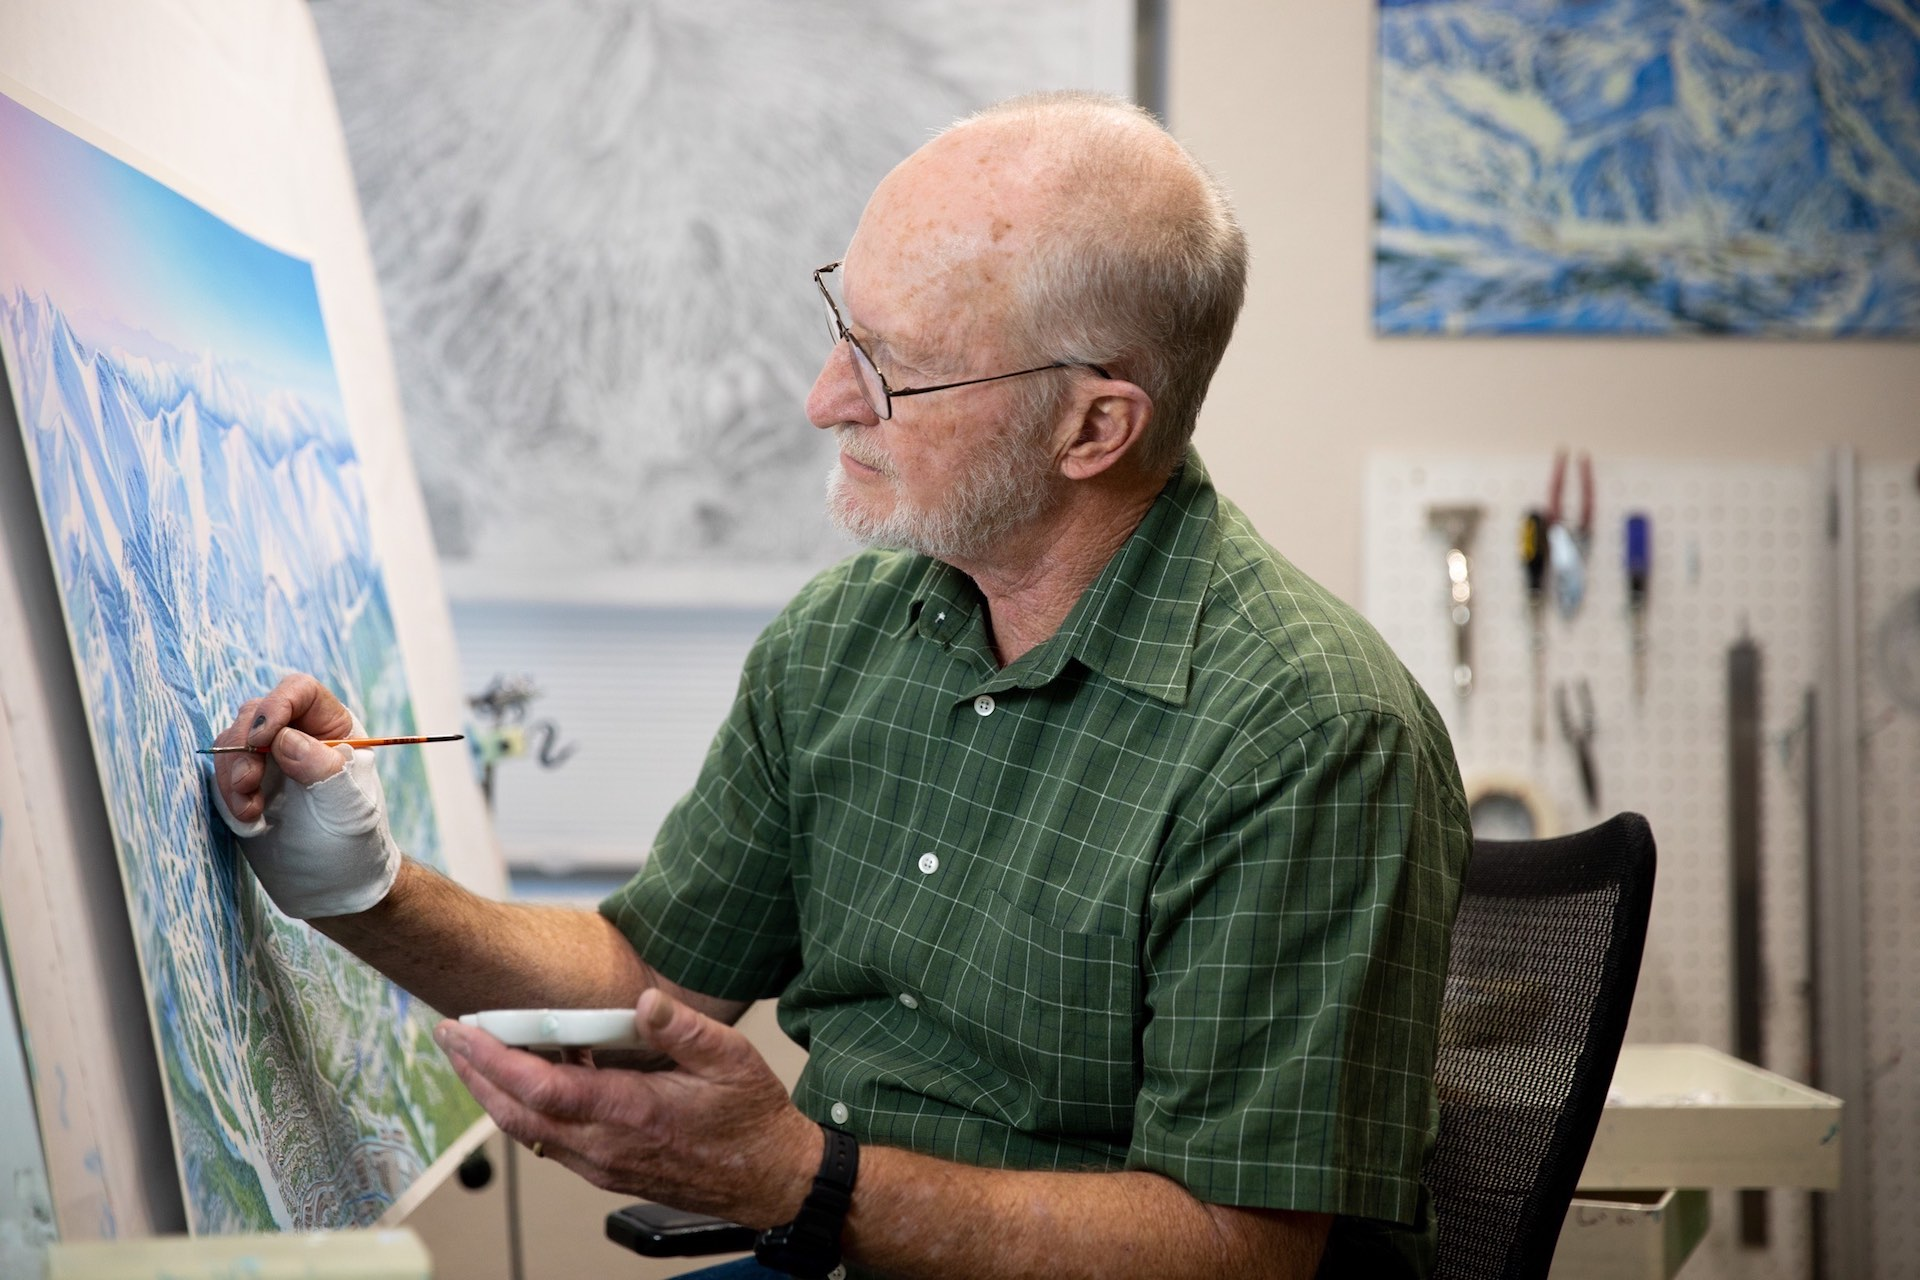 James Niehues ski map painter